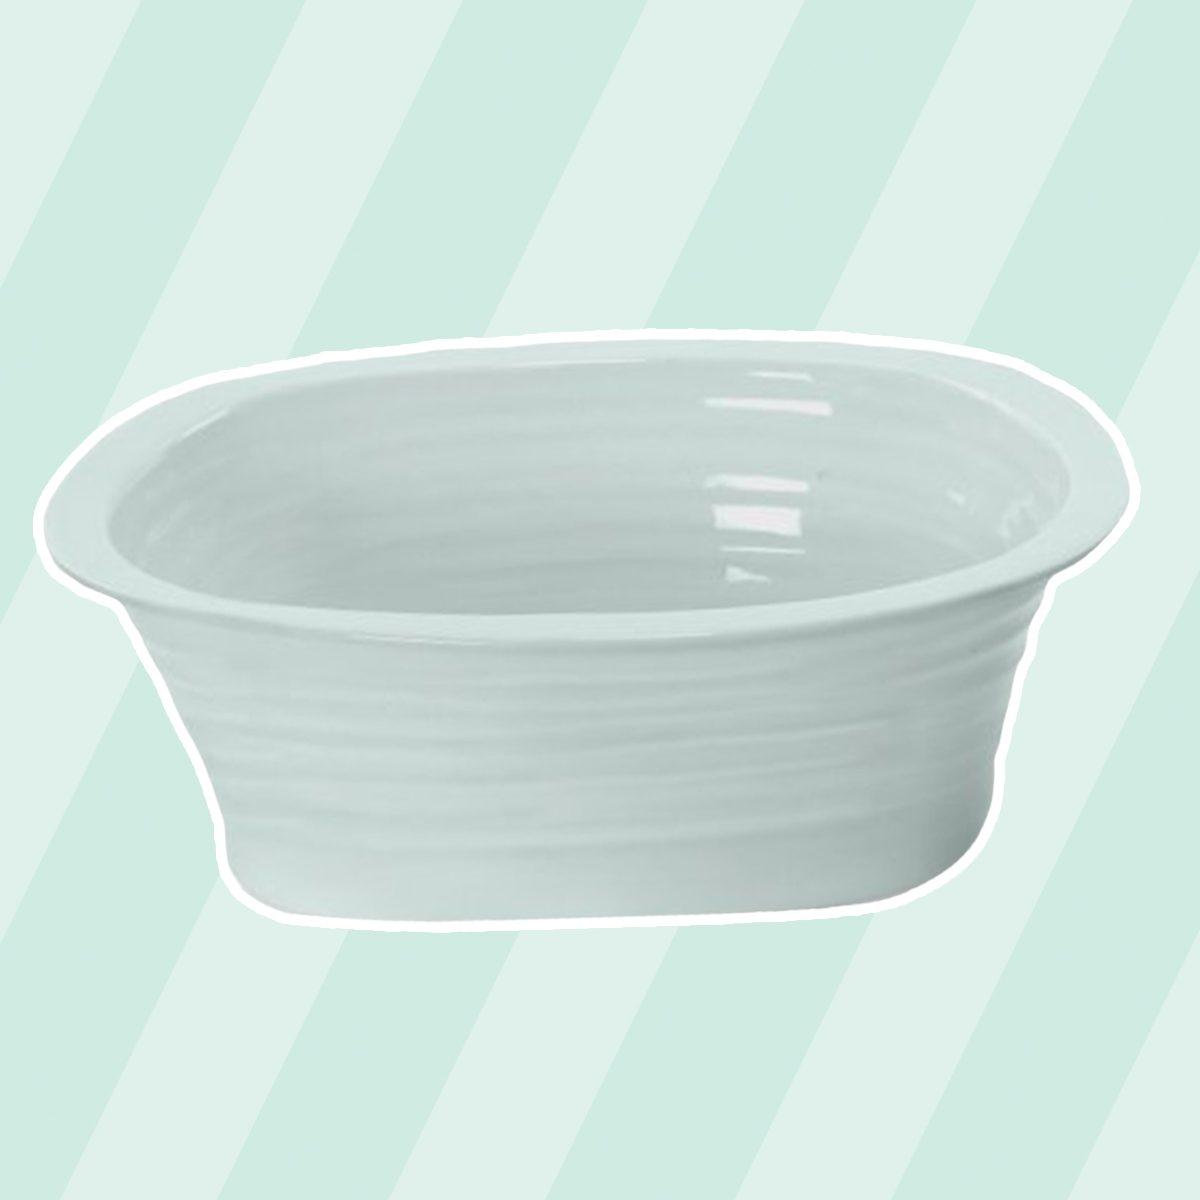 Portmeirion Rectangular Pie Dish 2